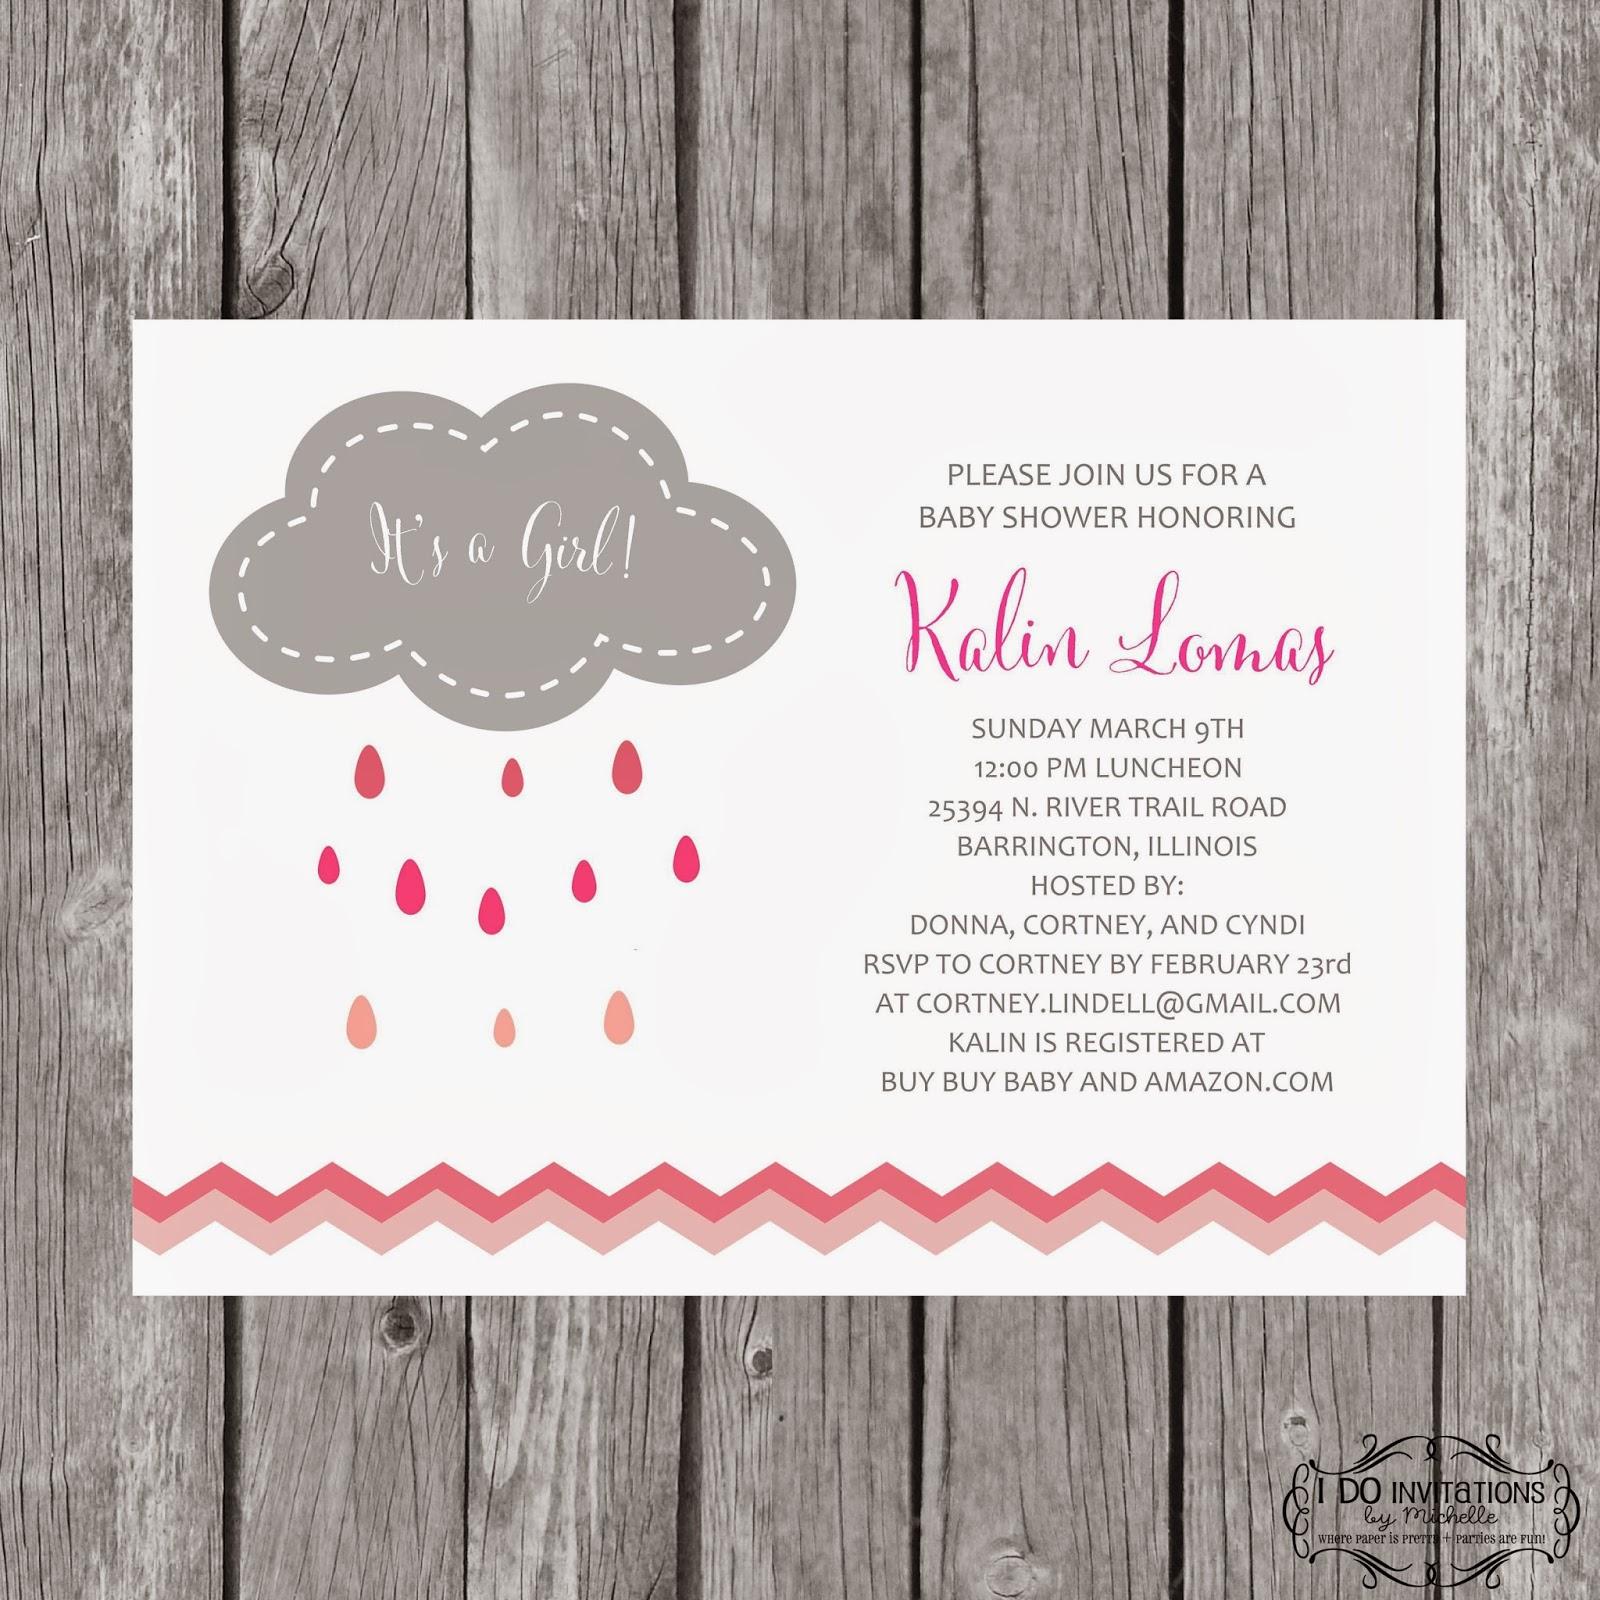 New Rain Cloud Baby Shower Invitations Ellery Designs